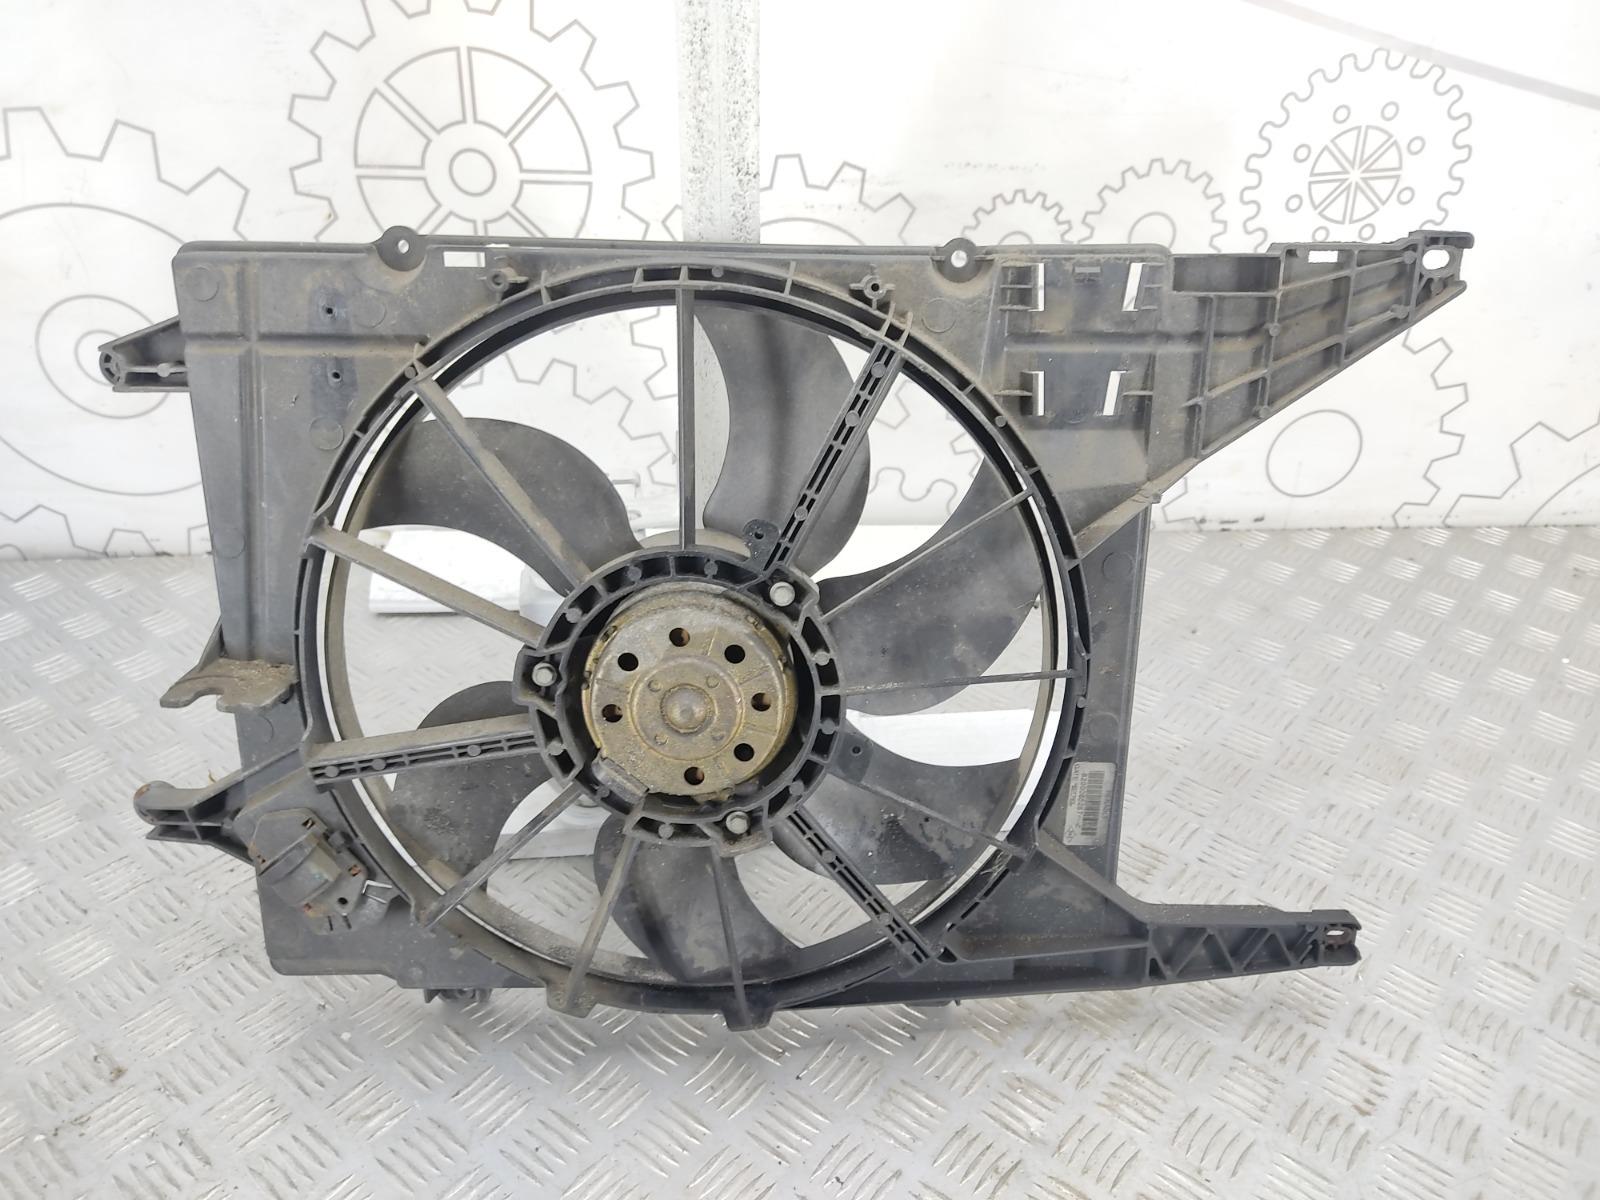 Вентилятор радиатора Renault Megane 1.4 I 2002 (б/у)